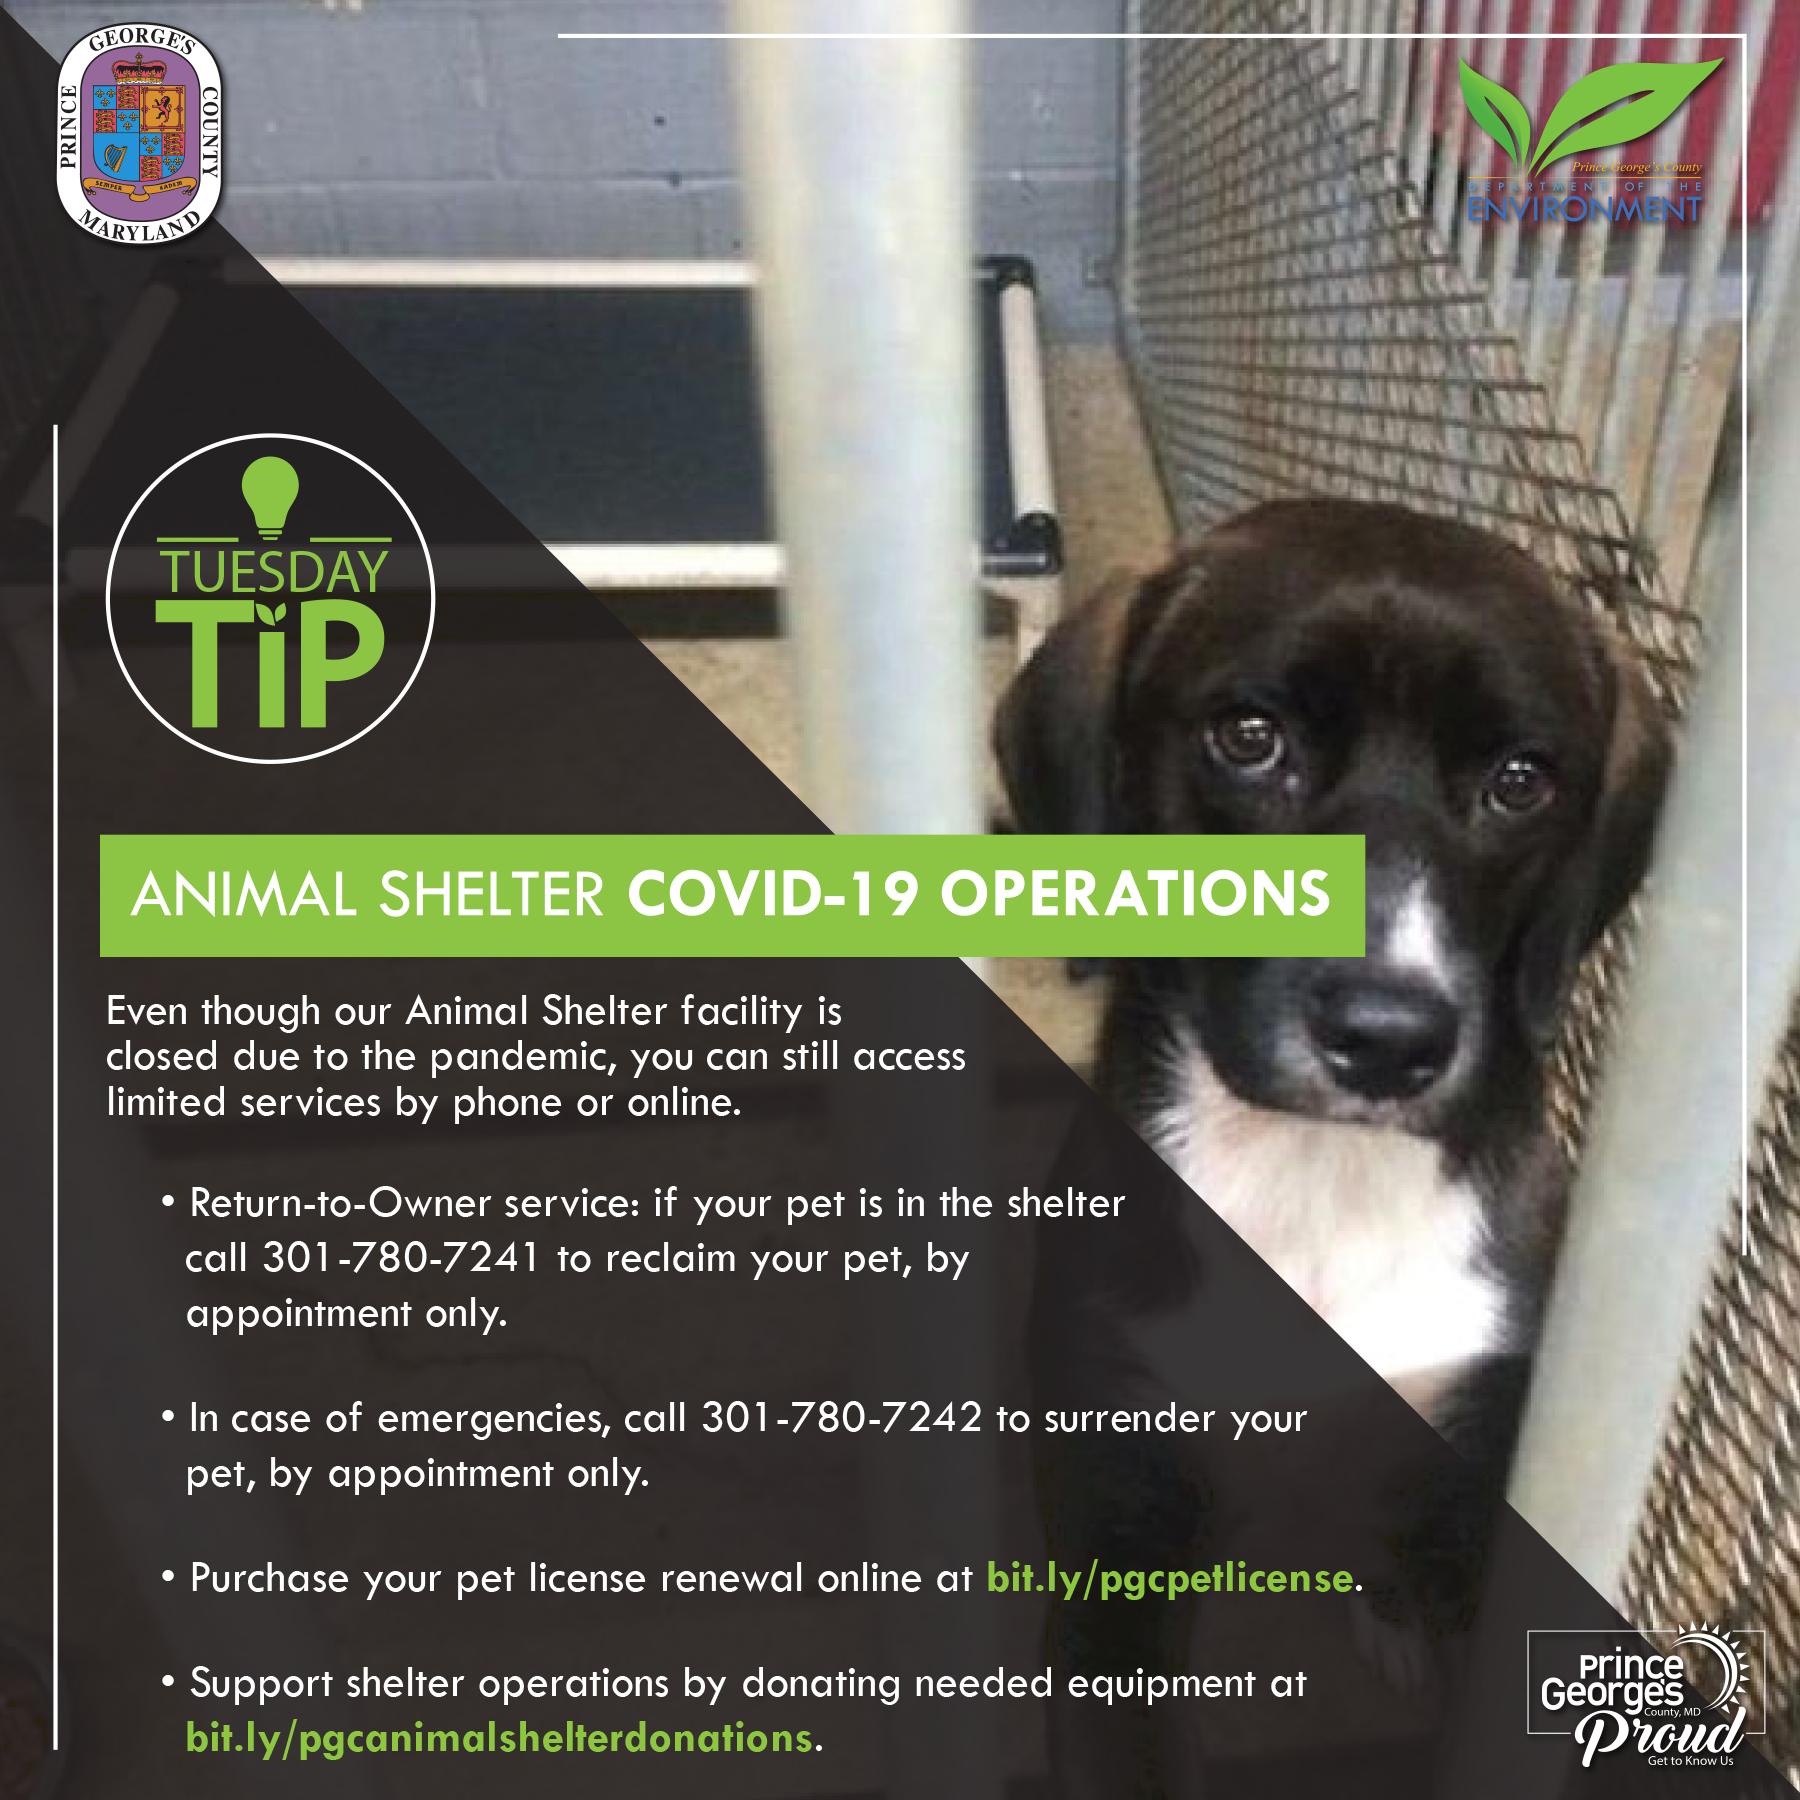 Tues tip 7.14.20 Animal shelter eng